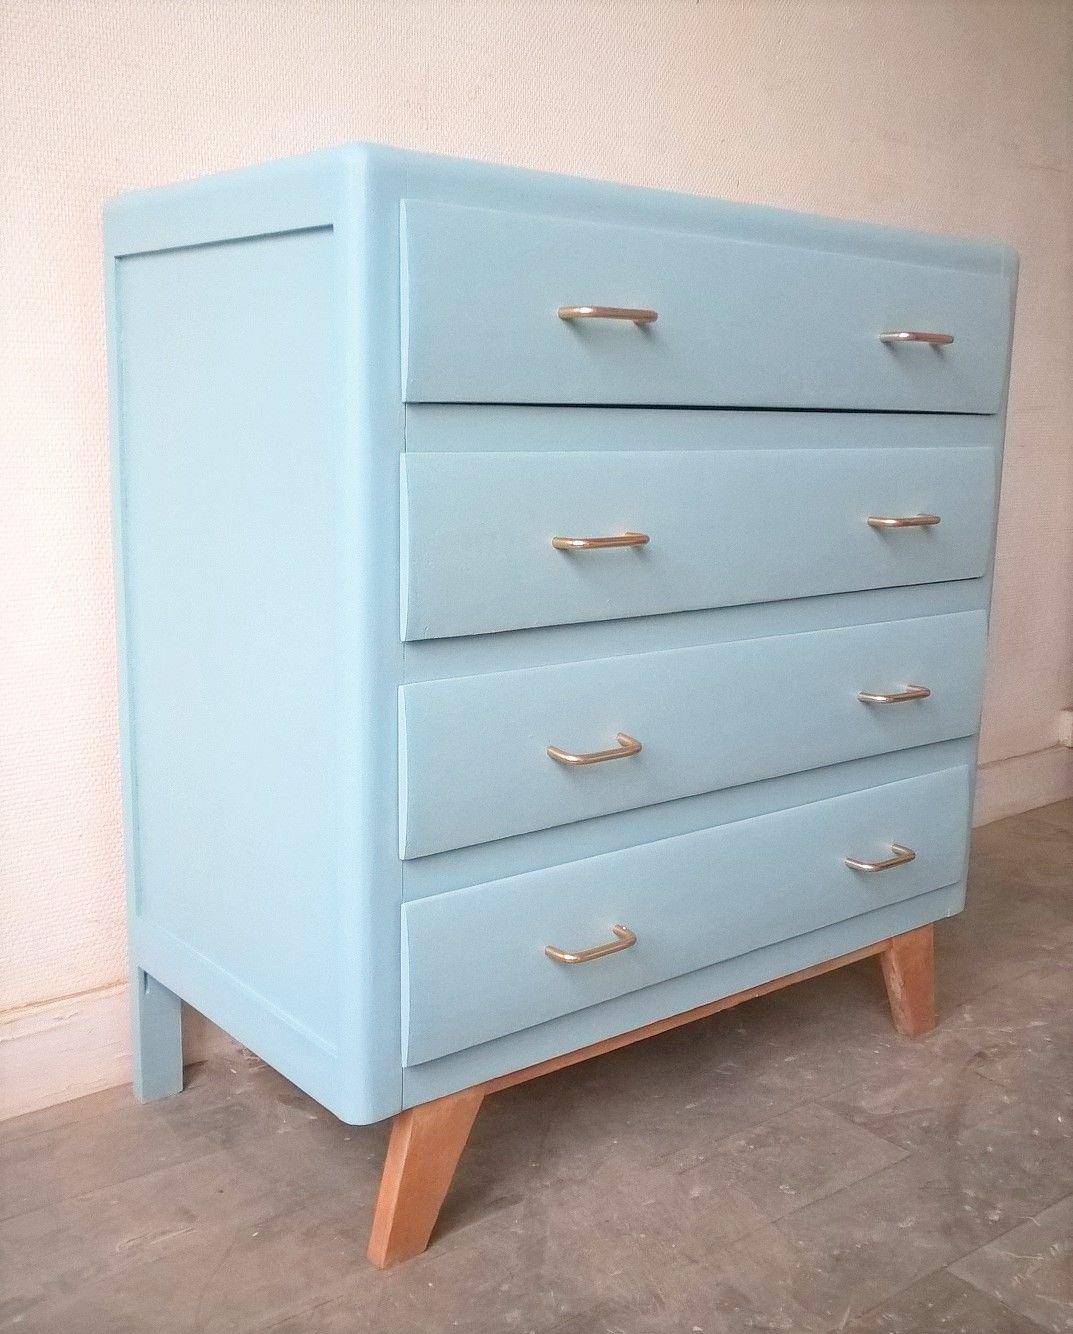 commode vintage des ann es 50 repeinte en bleu meubles vintage. Black Bedroom Furniture Sets. Home Design Ideas